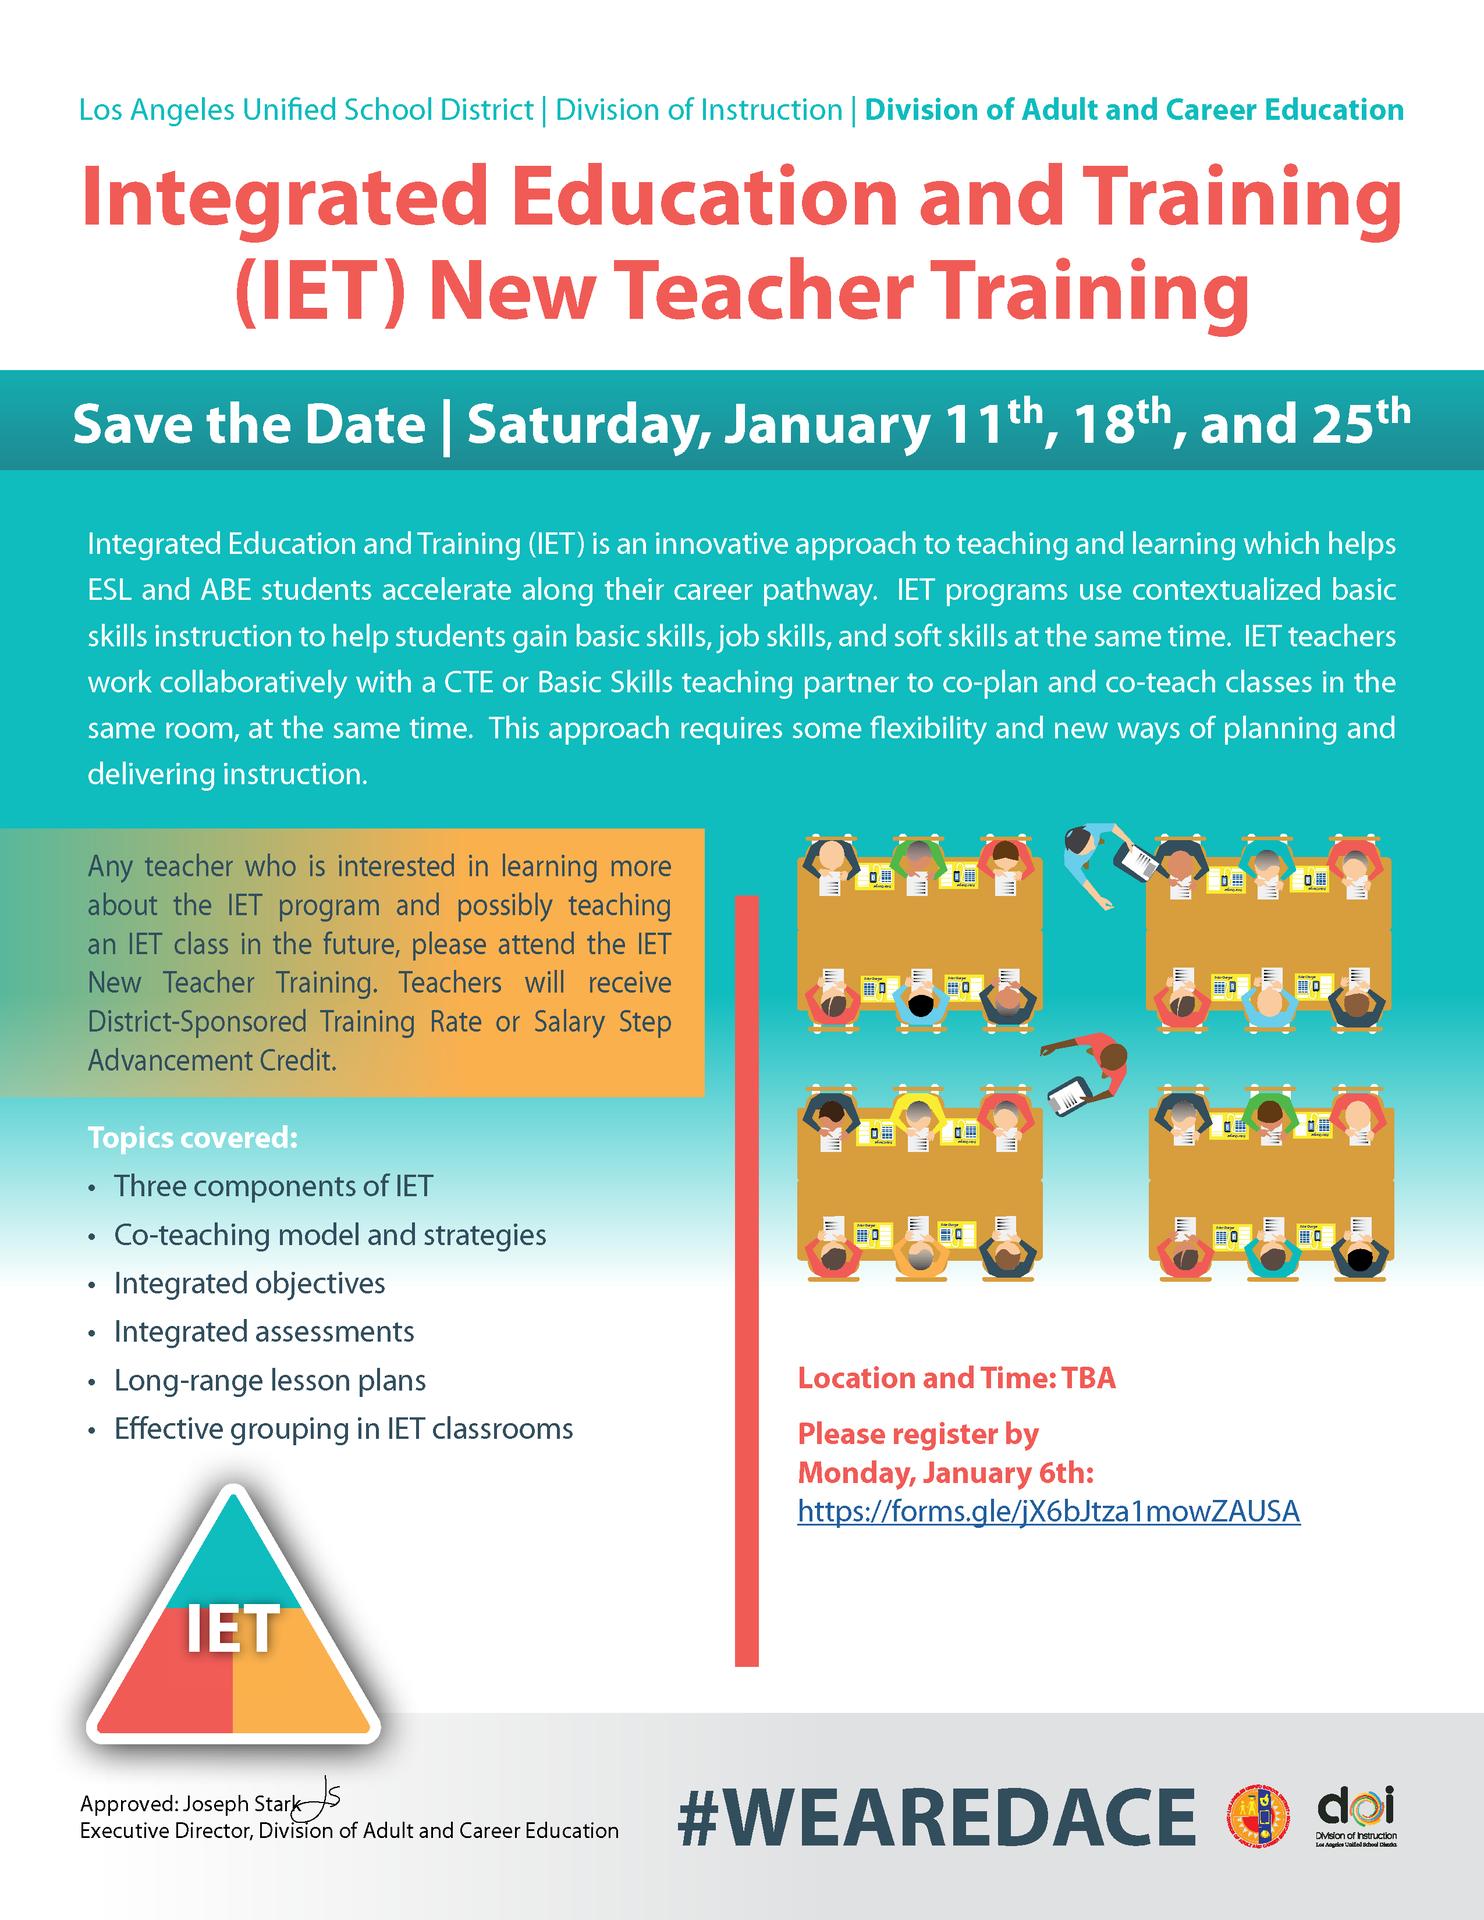 Teacher IET Training Opportunity